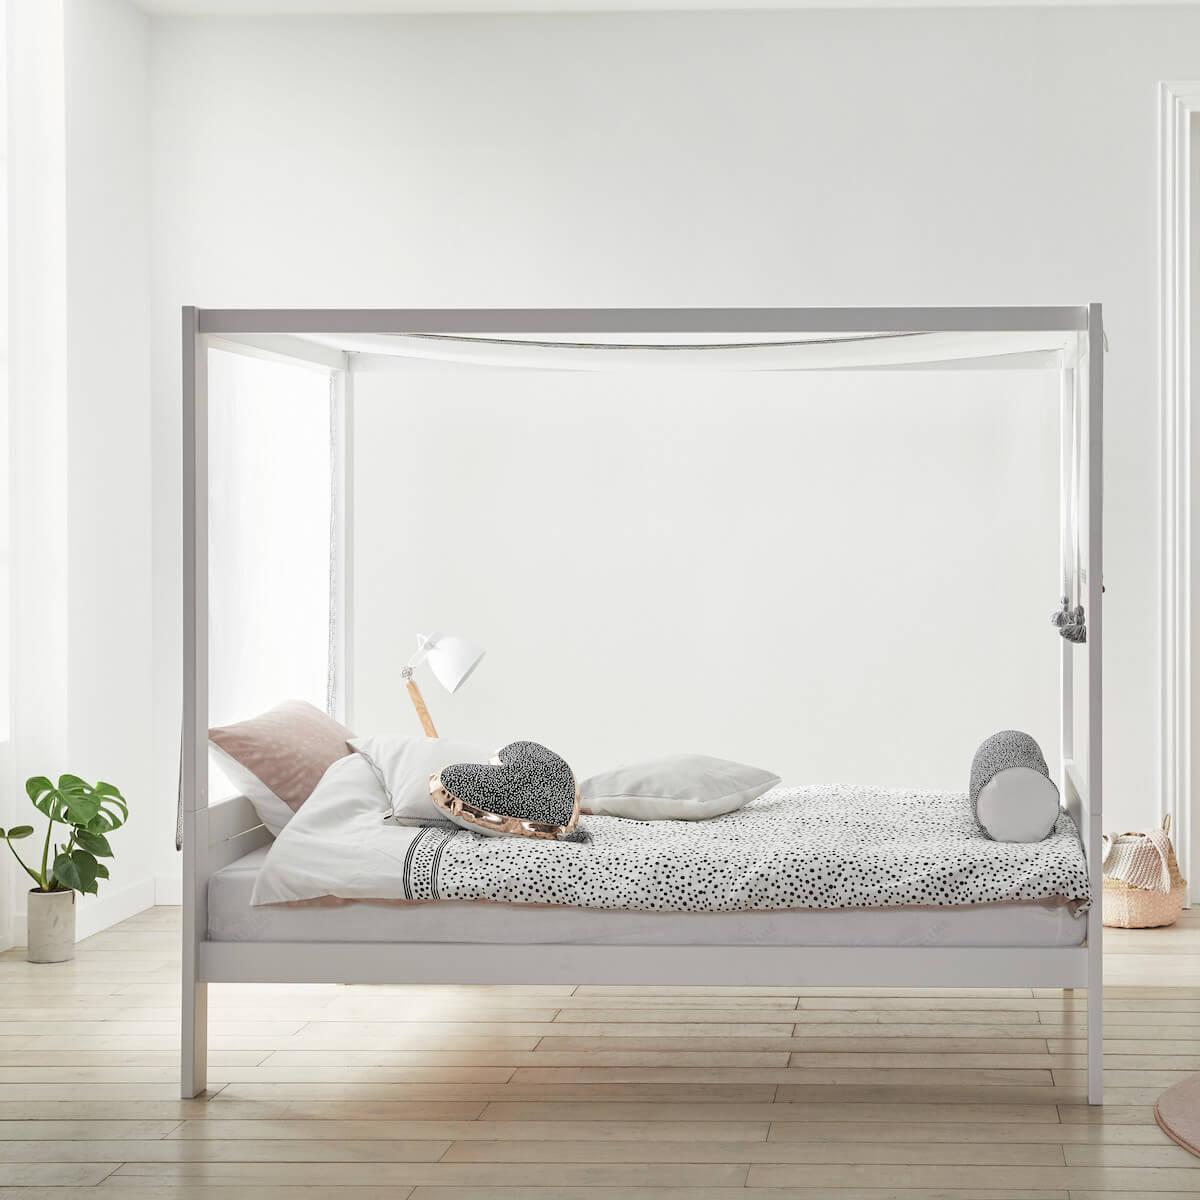 Cama dosel 120x200cm somier DELUXE Lifetime blanco